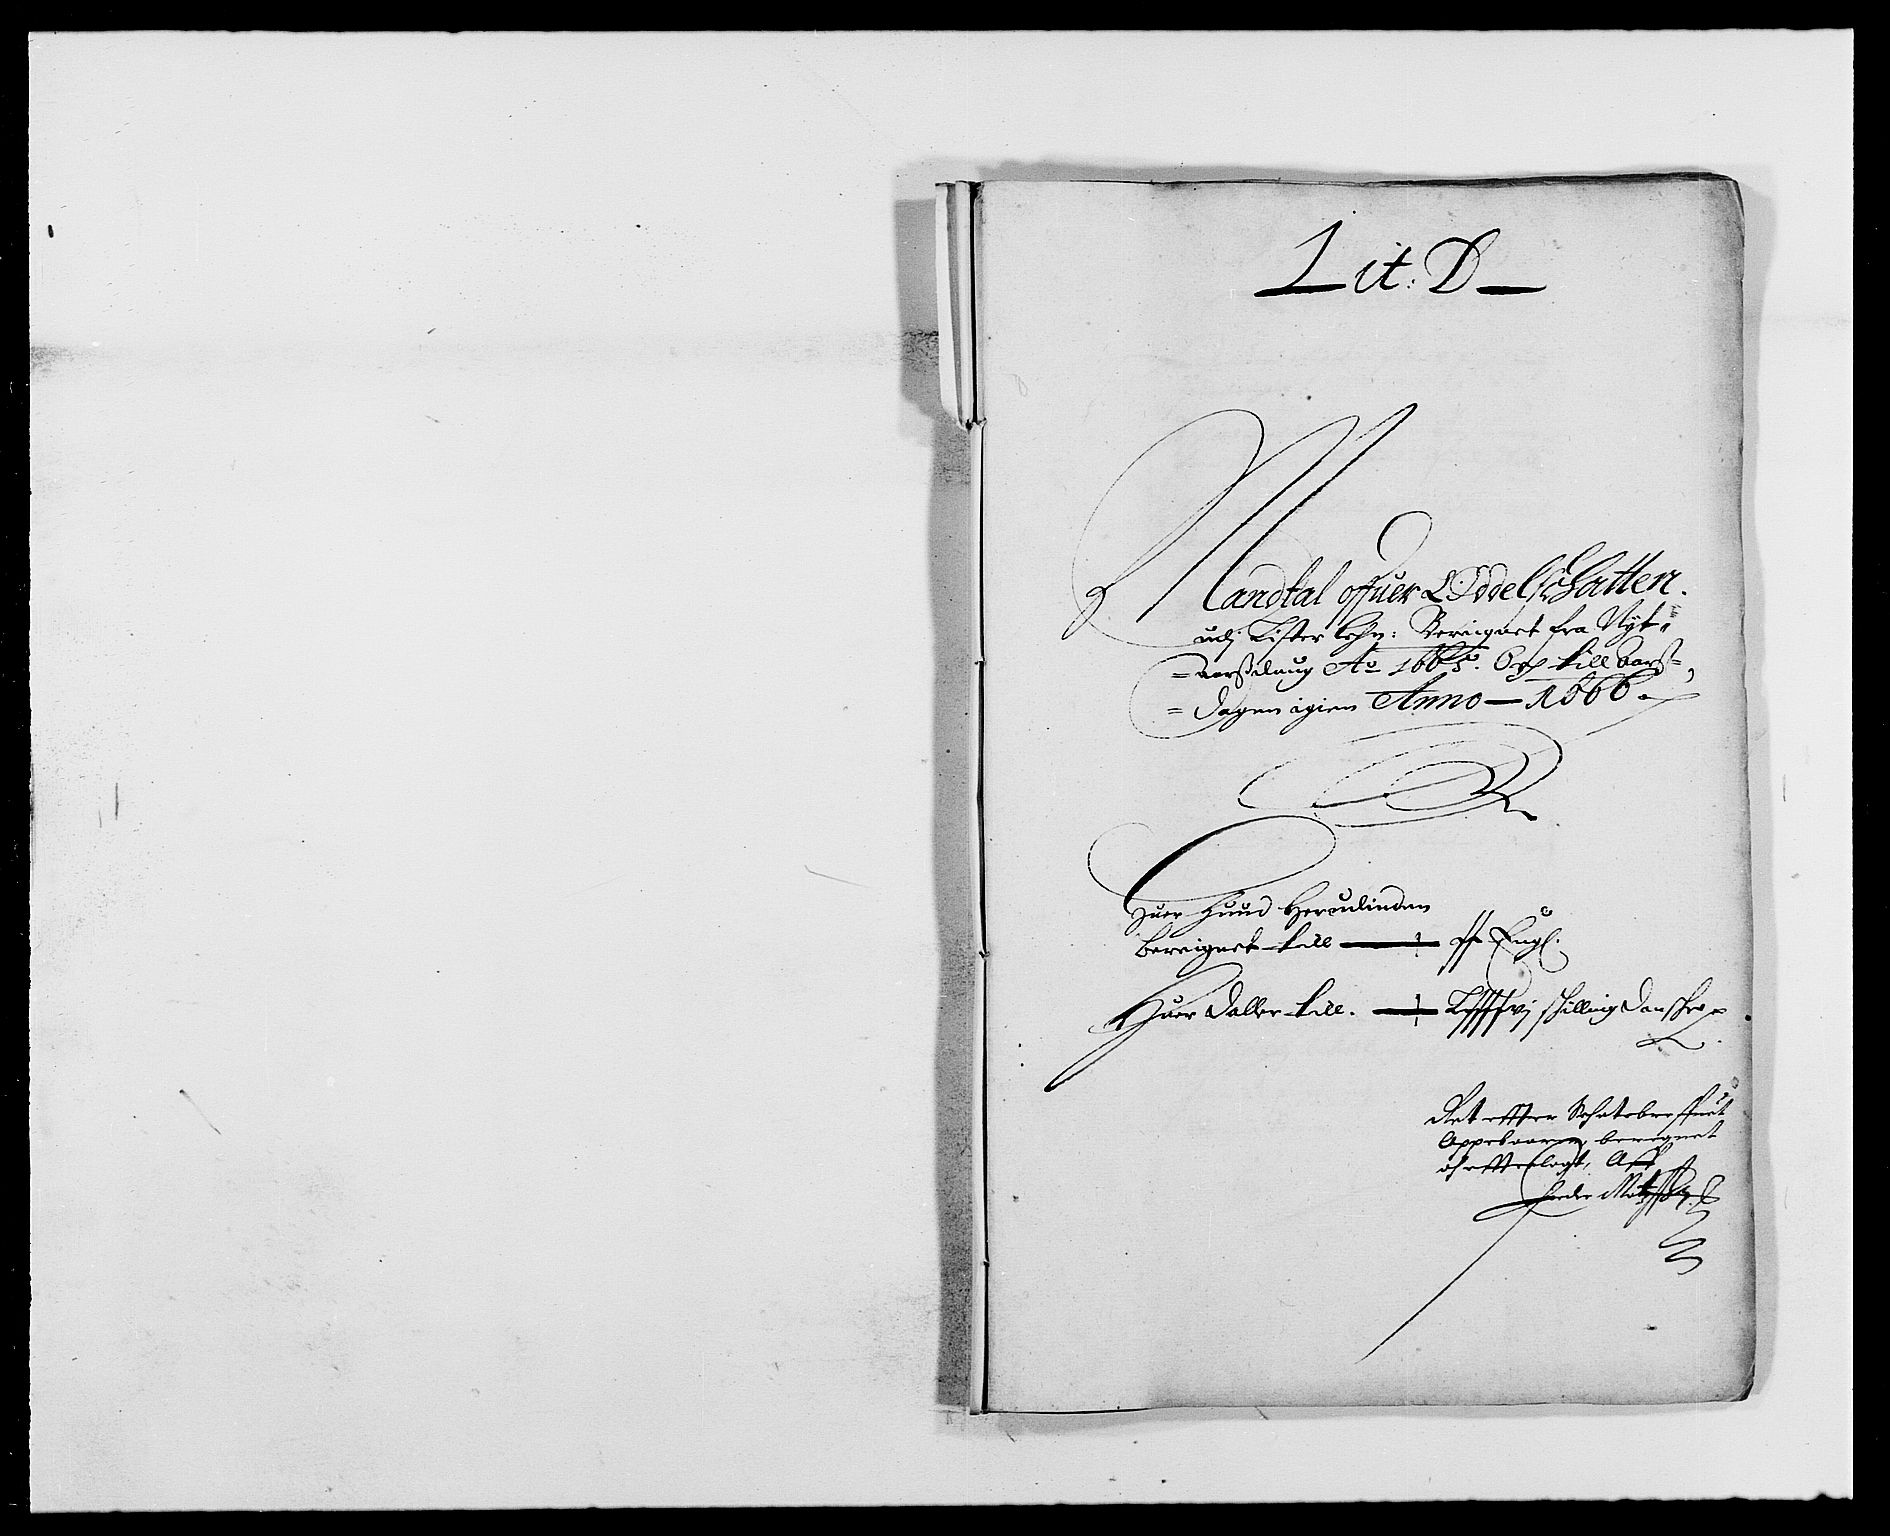 RA, Rentekammeret inntil 1814, Reviderte regnskaper, Fogderegnskap, R41/L2524: Fogderegnskap Lista, 1665-1668, s. 78